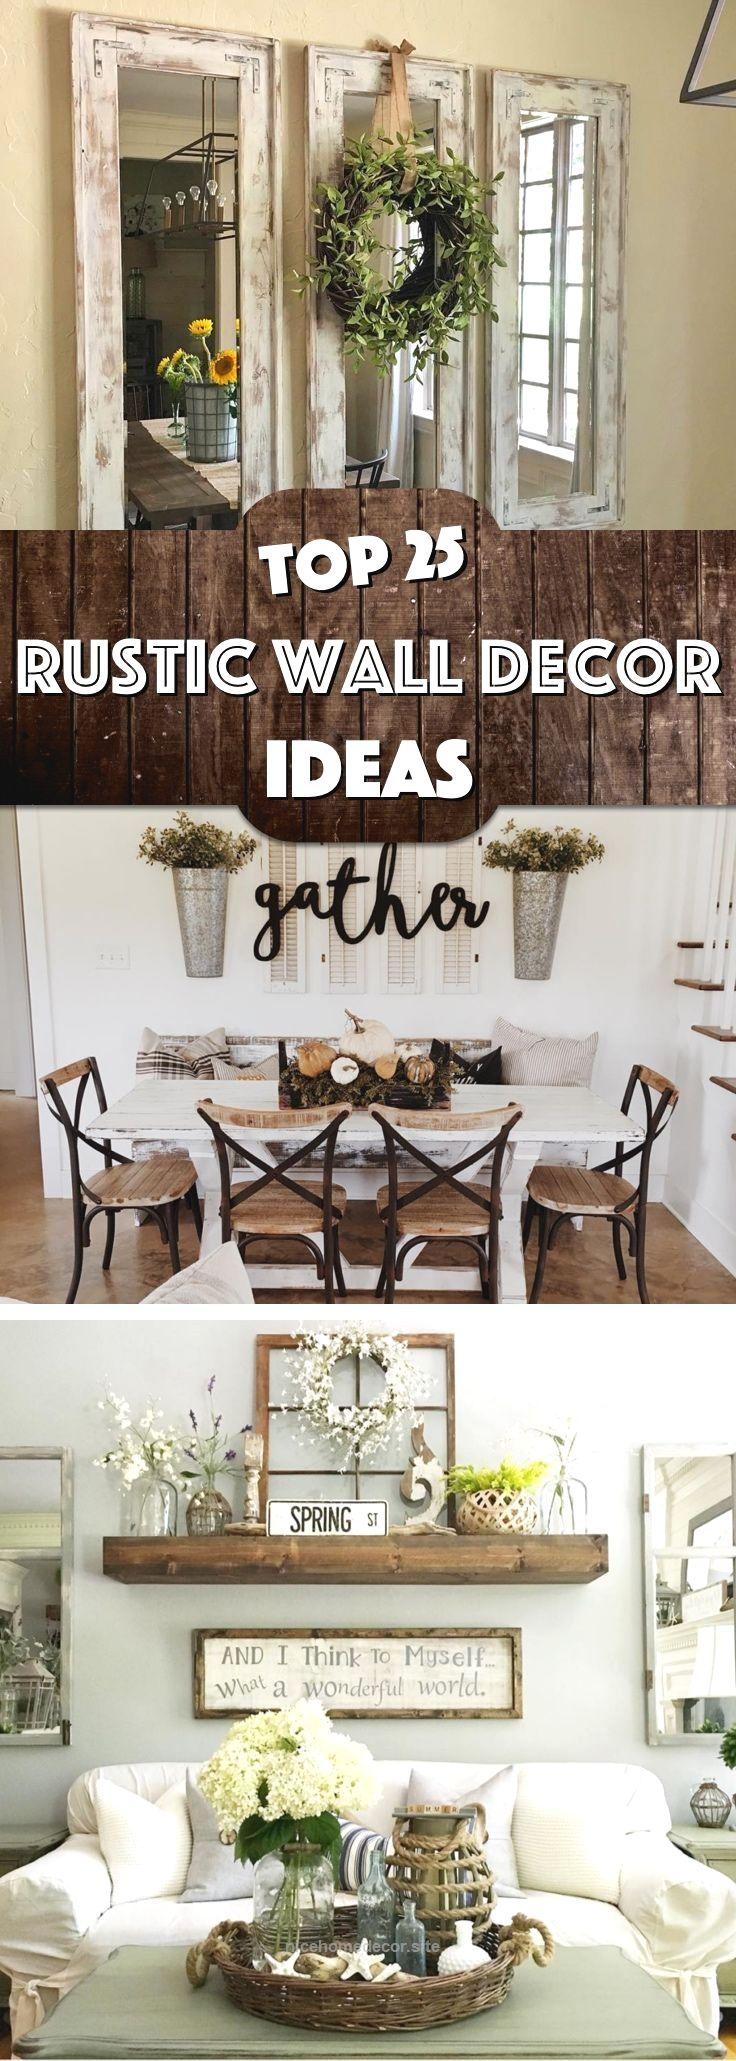 25 Must Try Rustic Wall Decor Ideas Featuring The Most Amazing Intended  Imperfecu2026 Http · Wohnzimmer InspirationDeko IdeenDekorationBastelnBaum ...